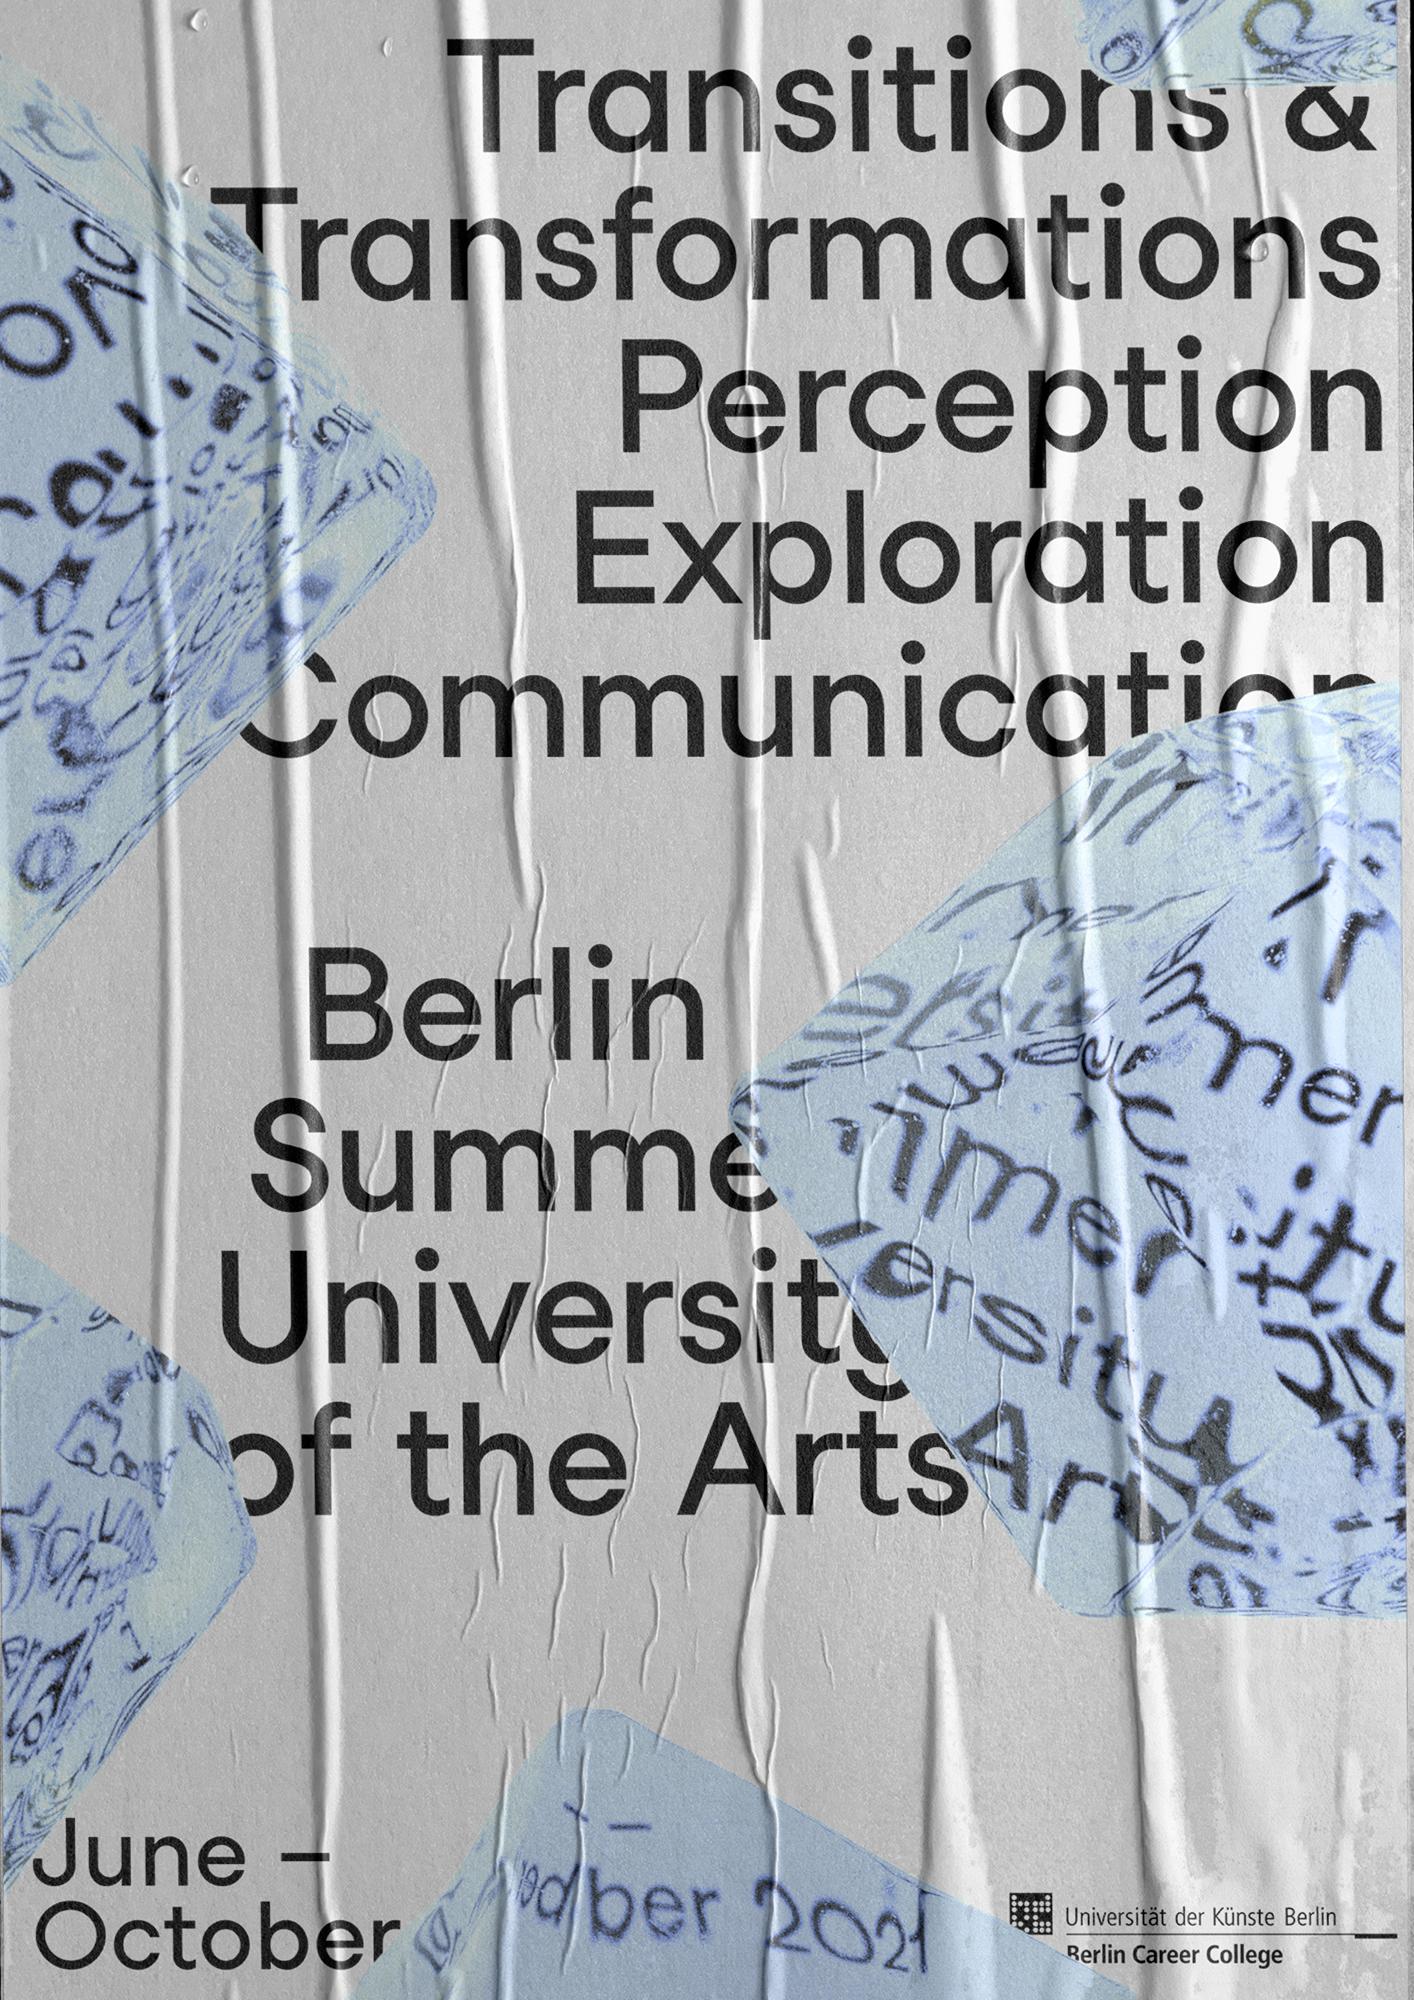 Tobias-Raschbacher-Berlin-Summer-University-Poster-Mockup-3